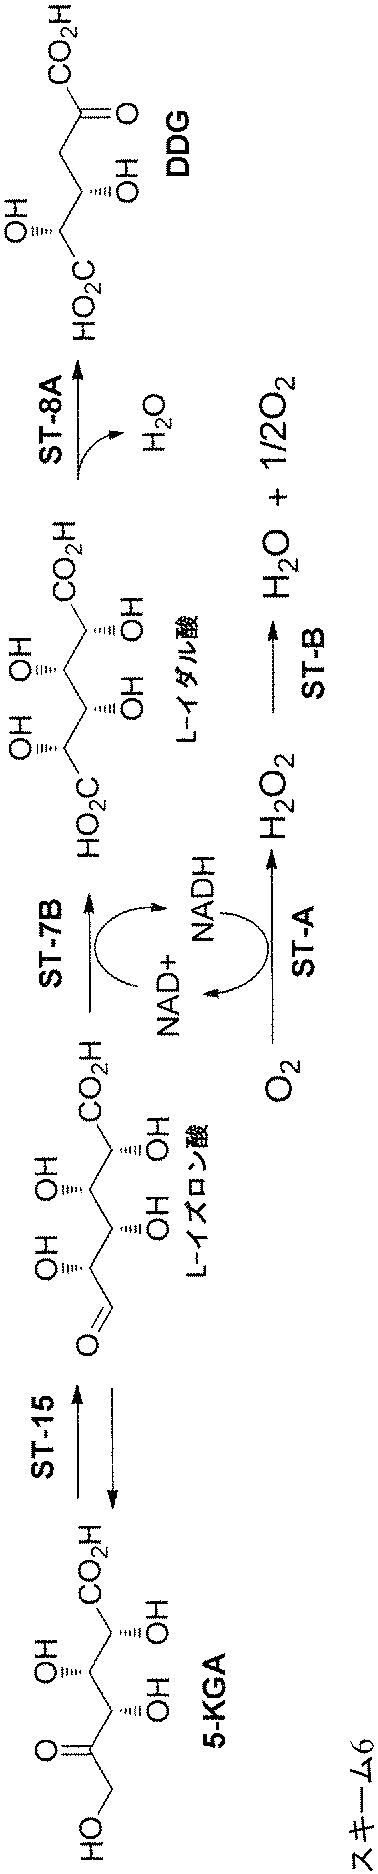 JP2015536641A - 化学物質およびその誘導体を生成するための組成物 ...